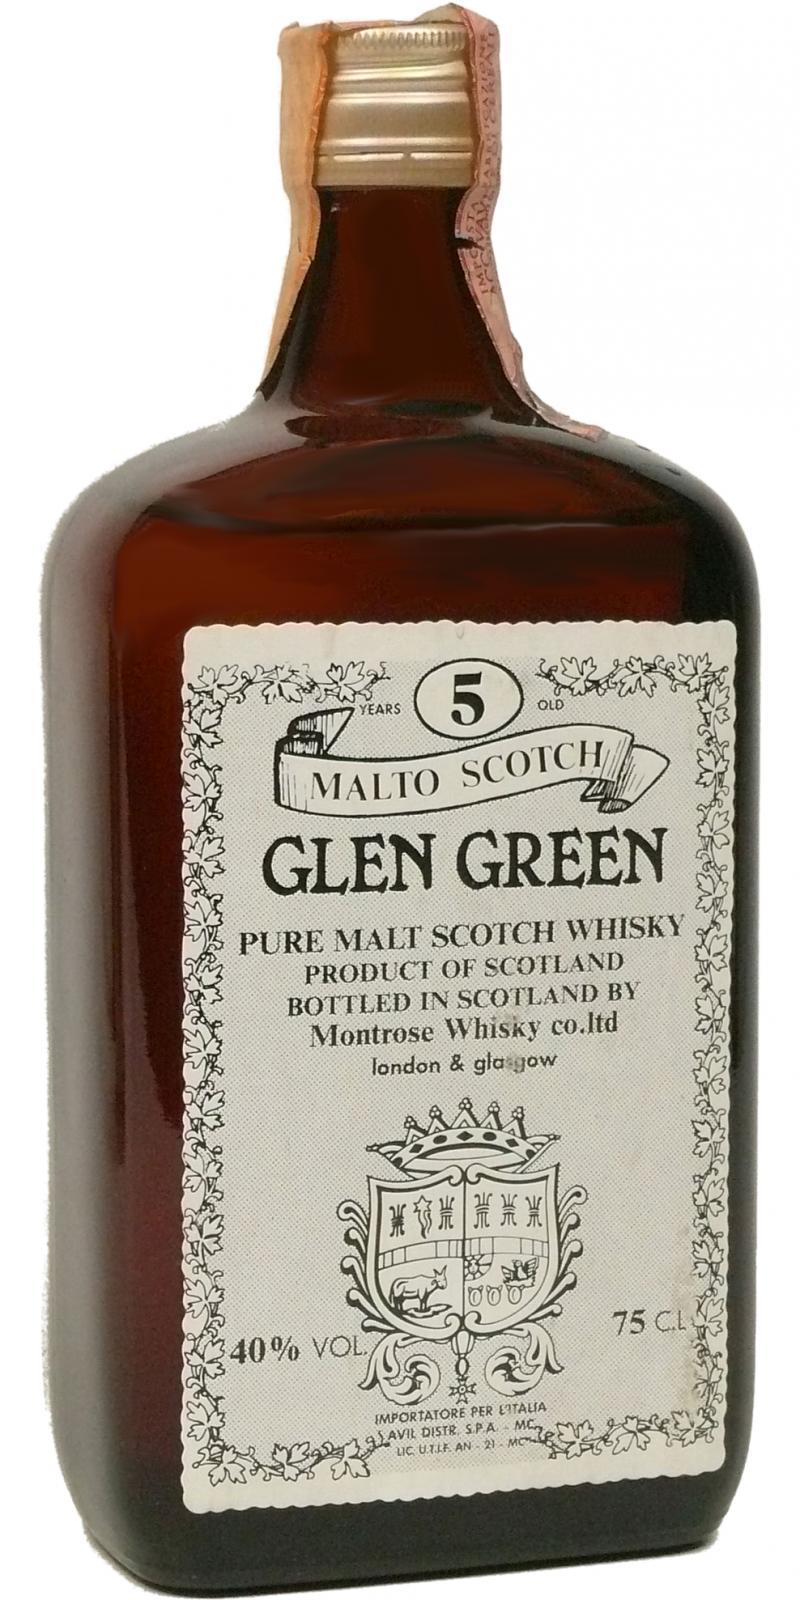 Glen Green 05-year-old